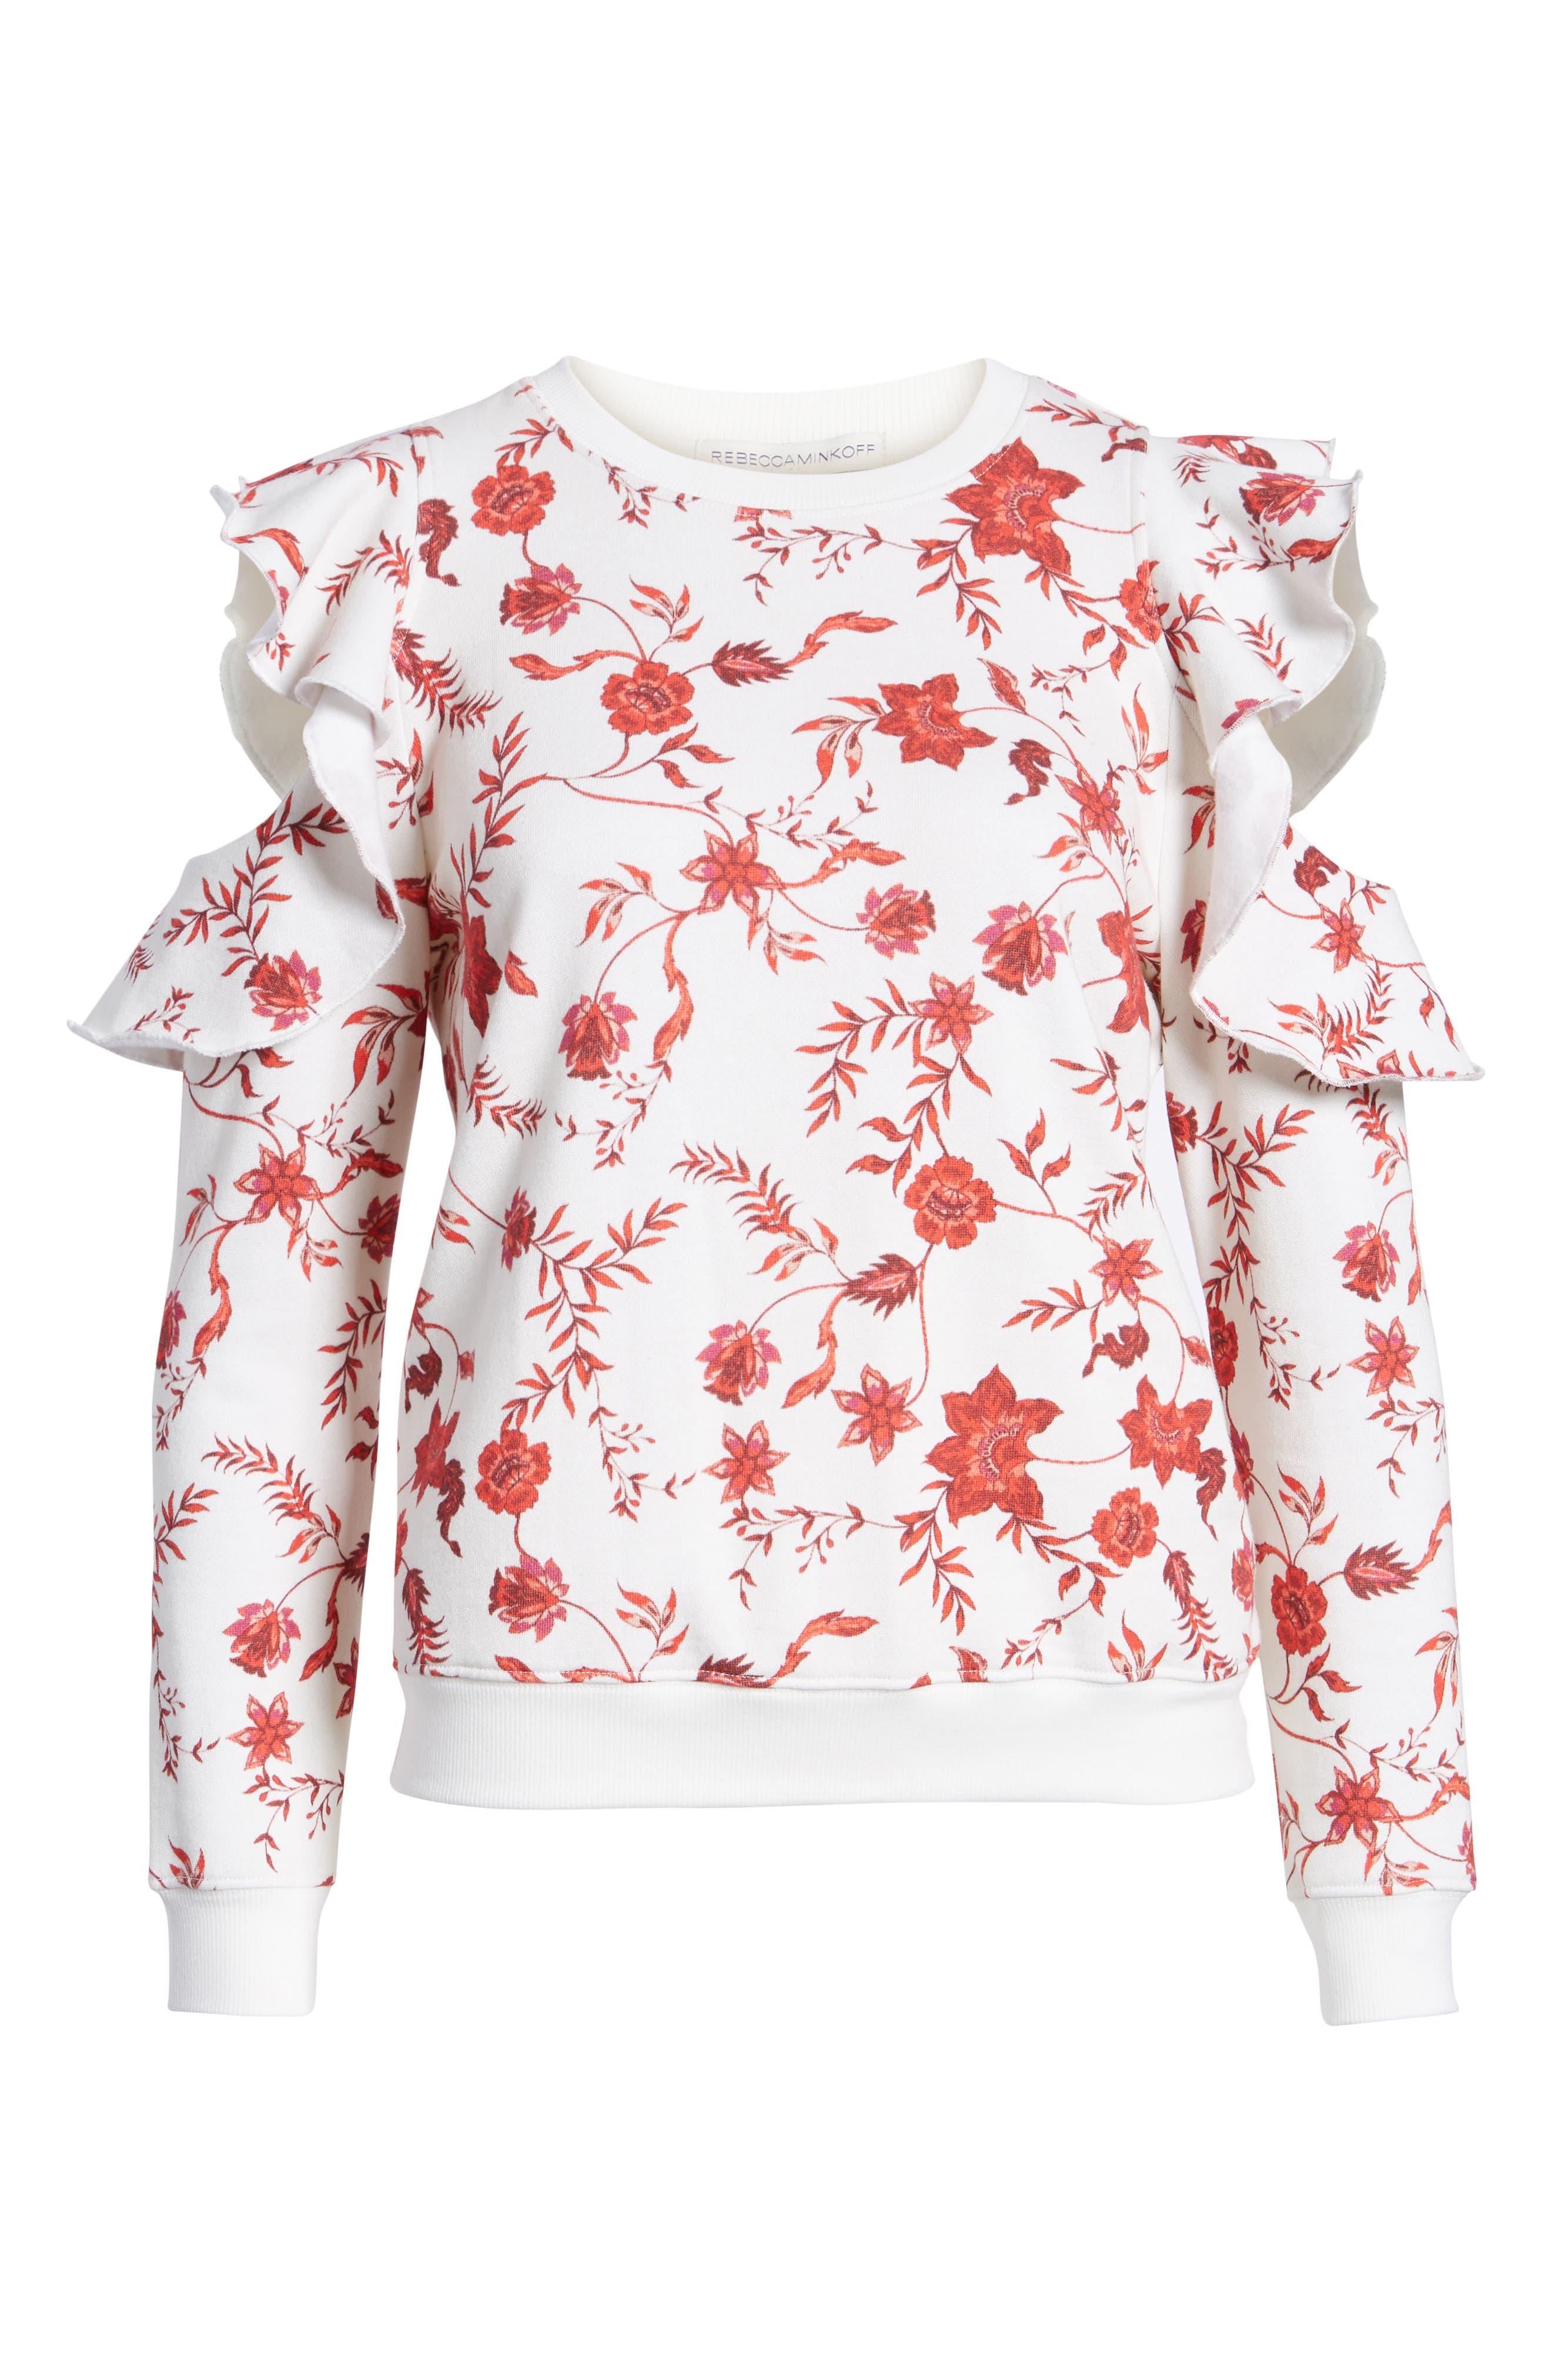 REBECCA MINKOFF,                             Gracie Cold Shoulder Floral Sweatshirt,                             Alternate thumbnail 7, color,                             900